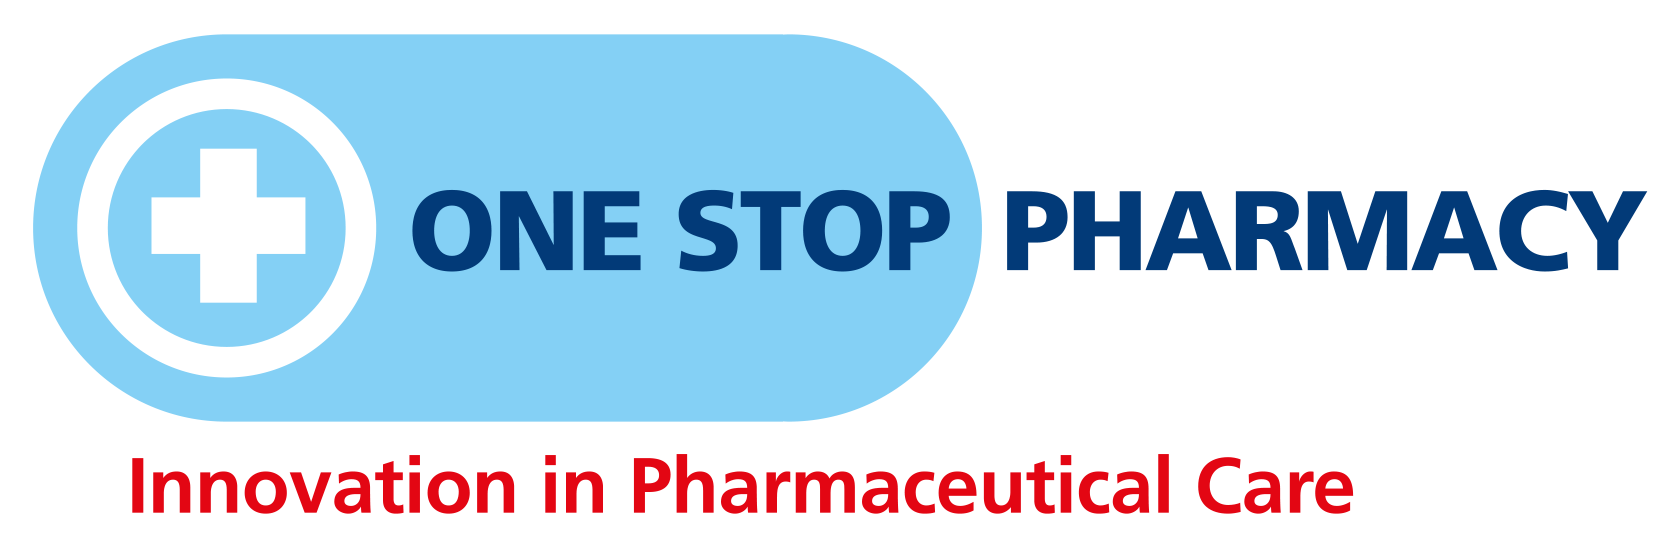 One Stop Pharmacy Ltd